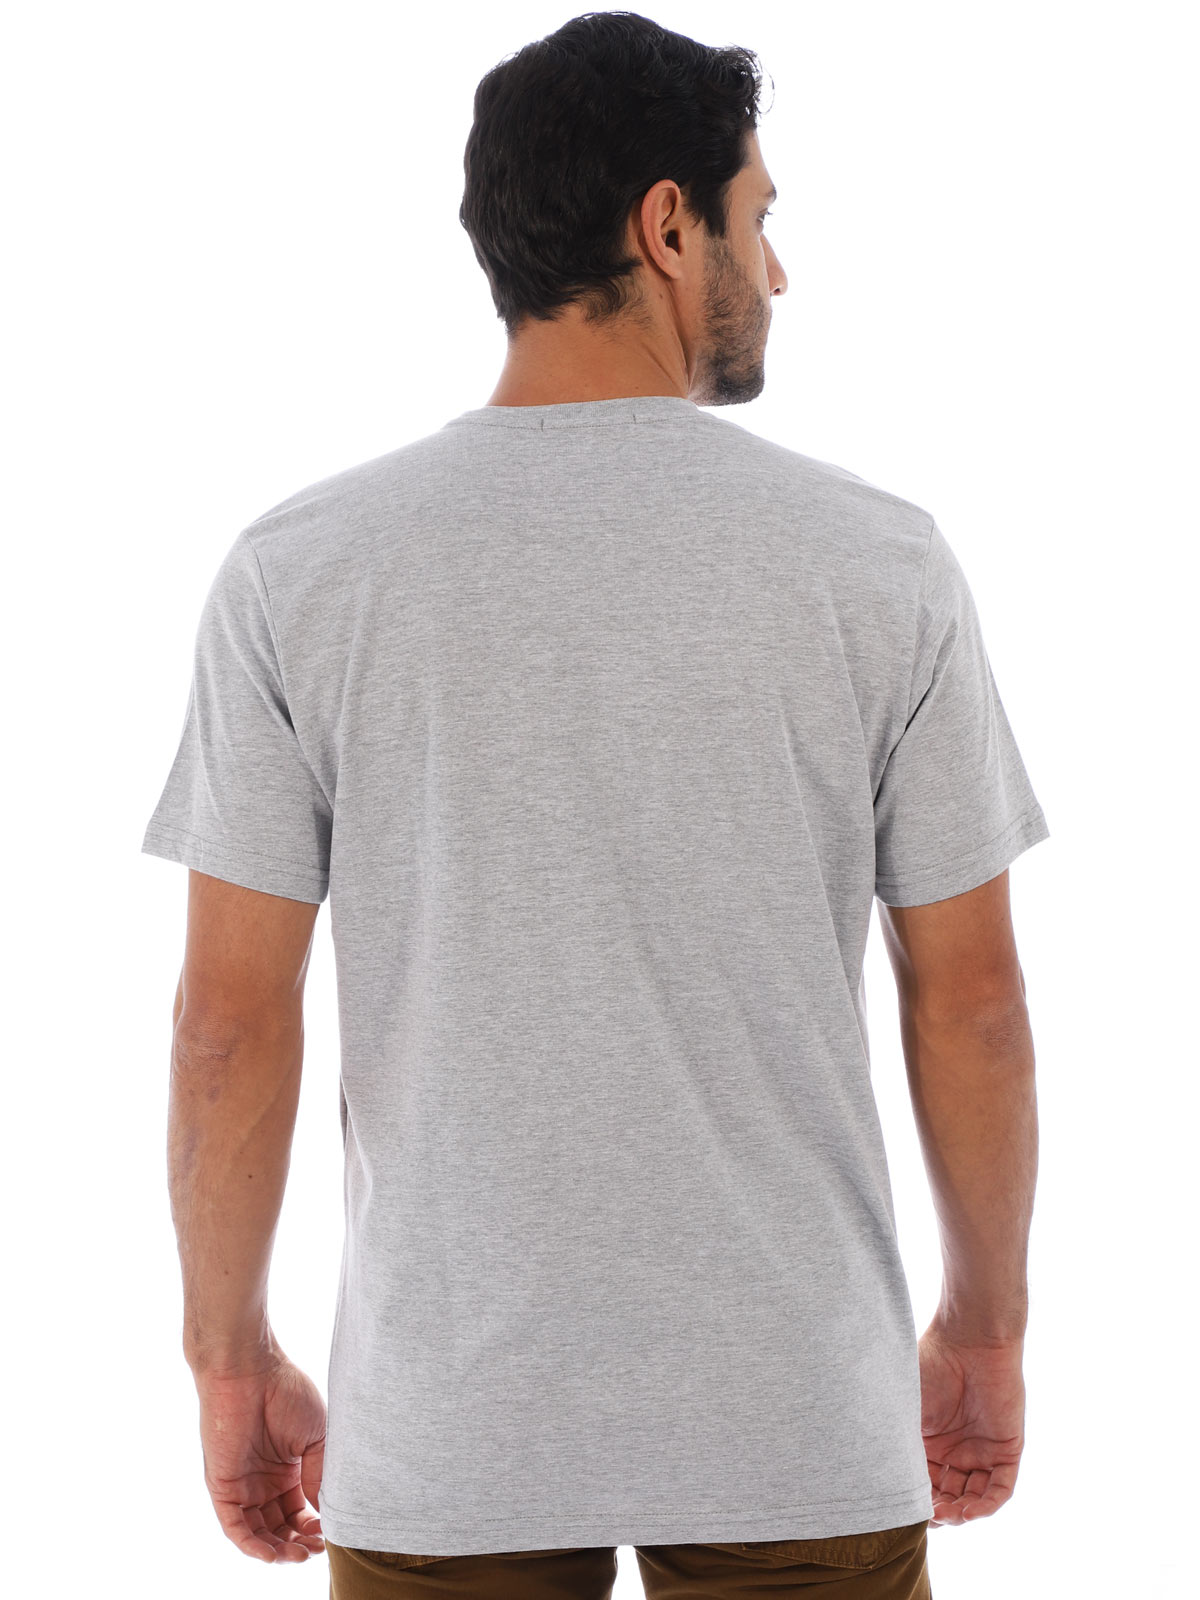 Camiseta Masculina Básica Algodão Estampa Sneakears Mescla